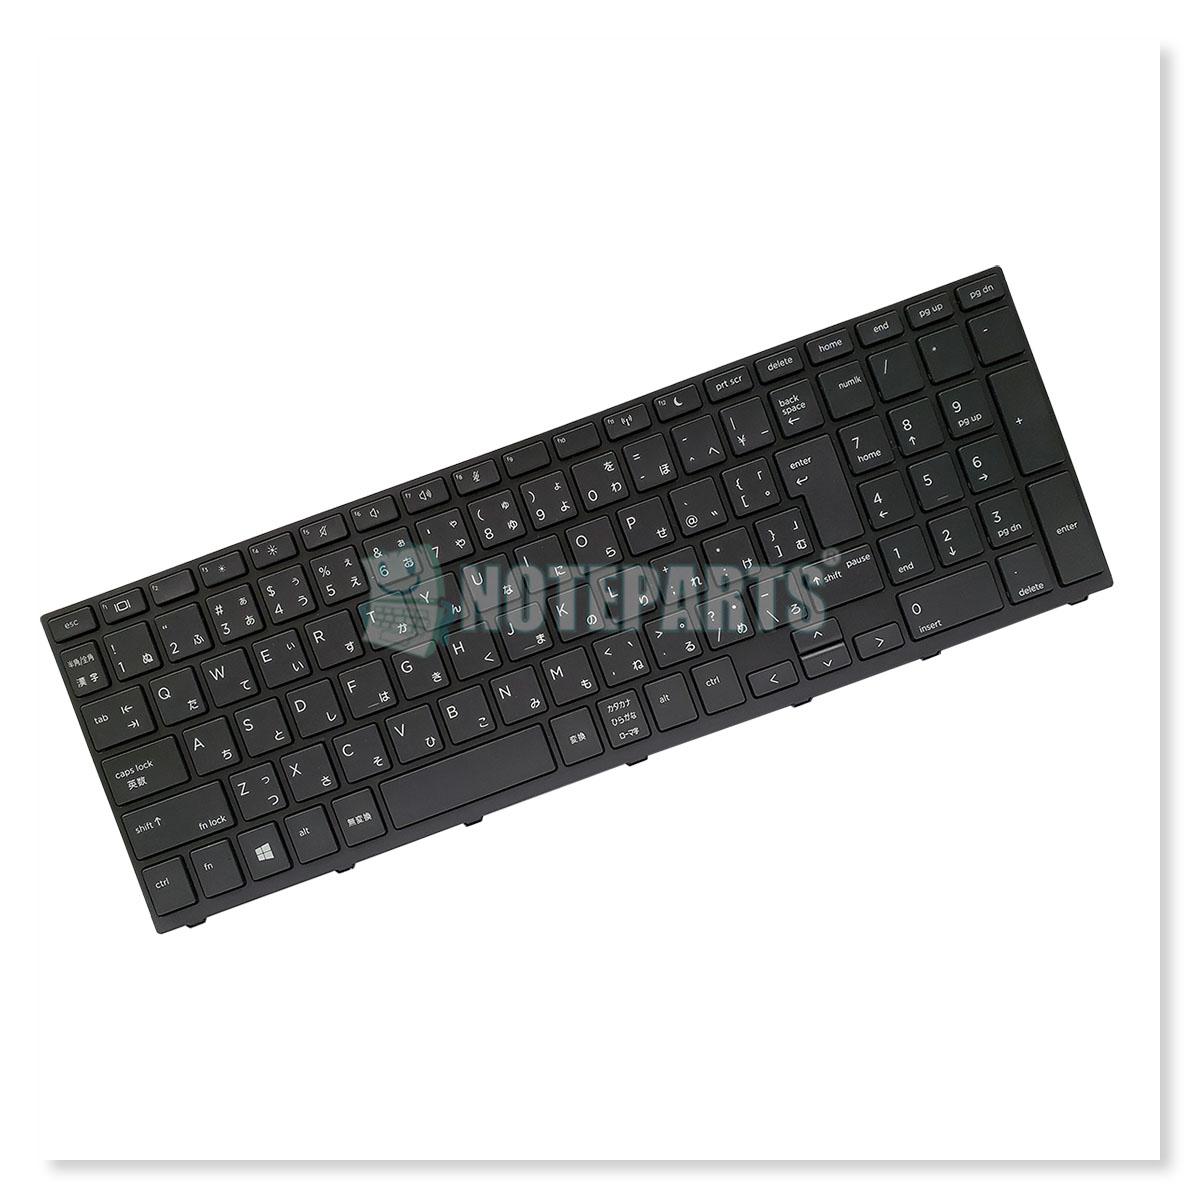 HP ProBook 450 G5 455 G5 470 G5 日本語キーボード 外枠付き